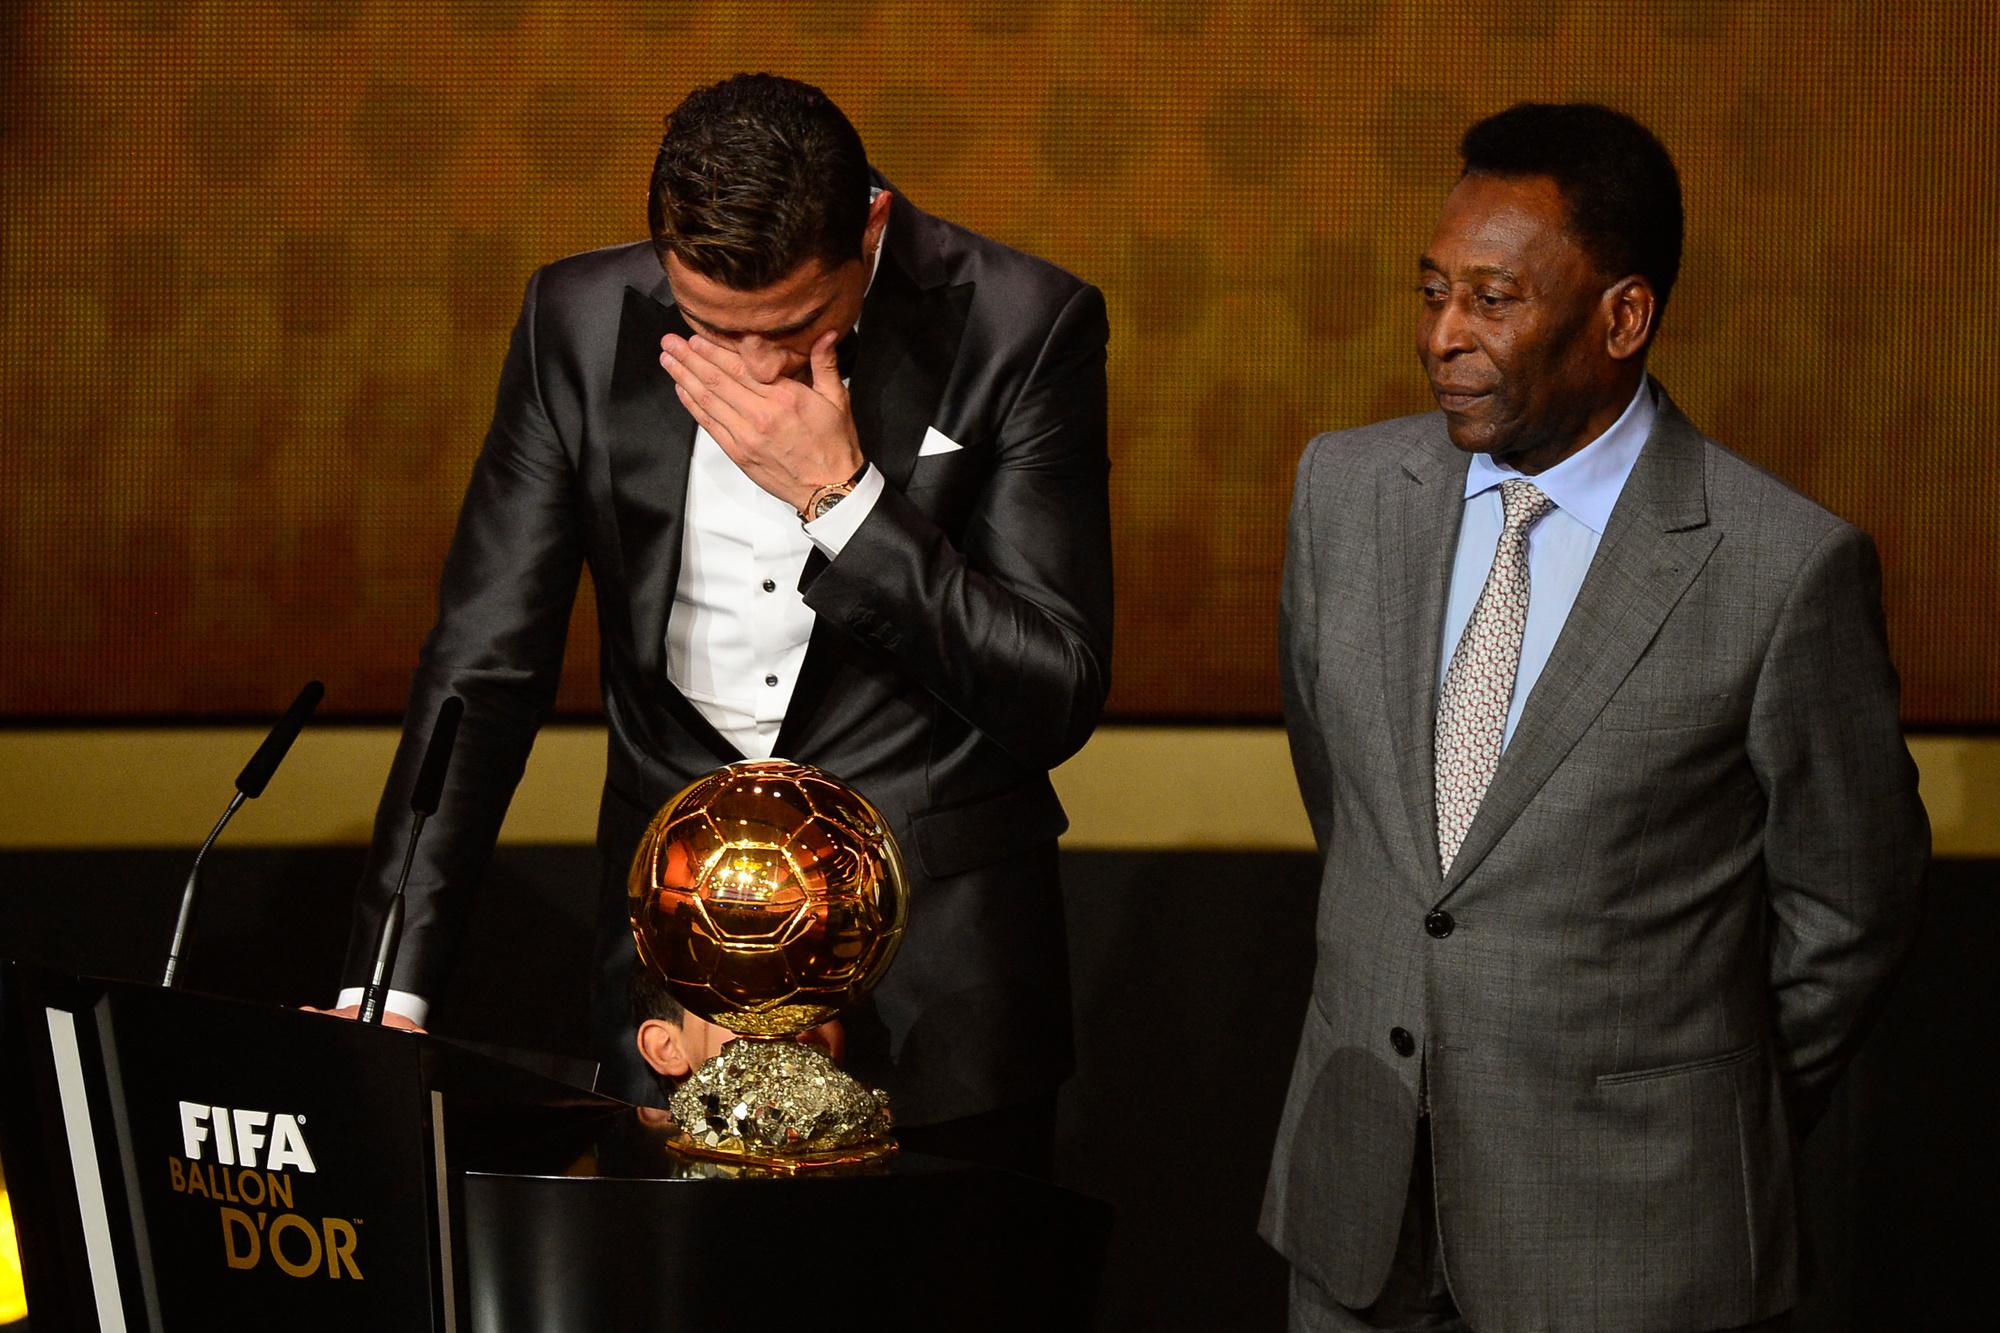 Les larmes de Cristiano n'y changeront rien. Les bons comptes font les bons amis., belga